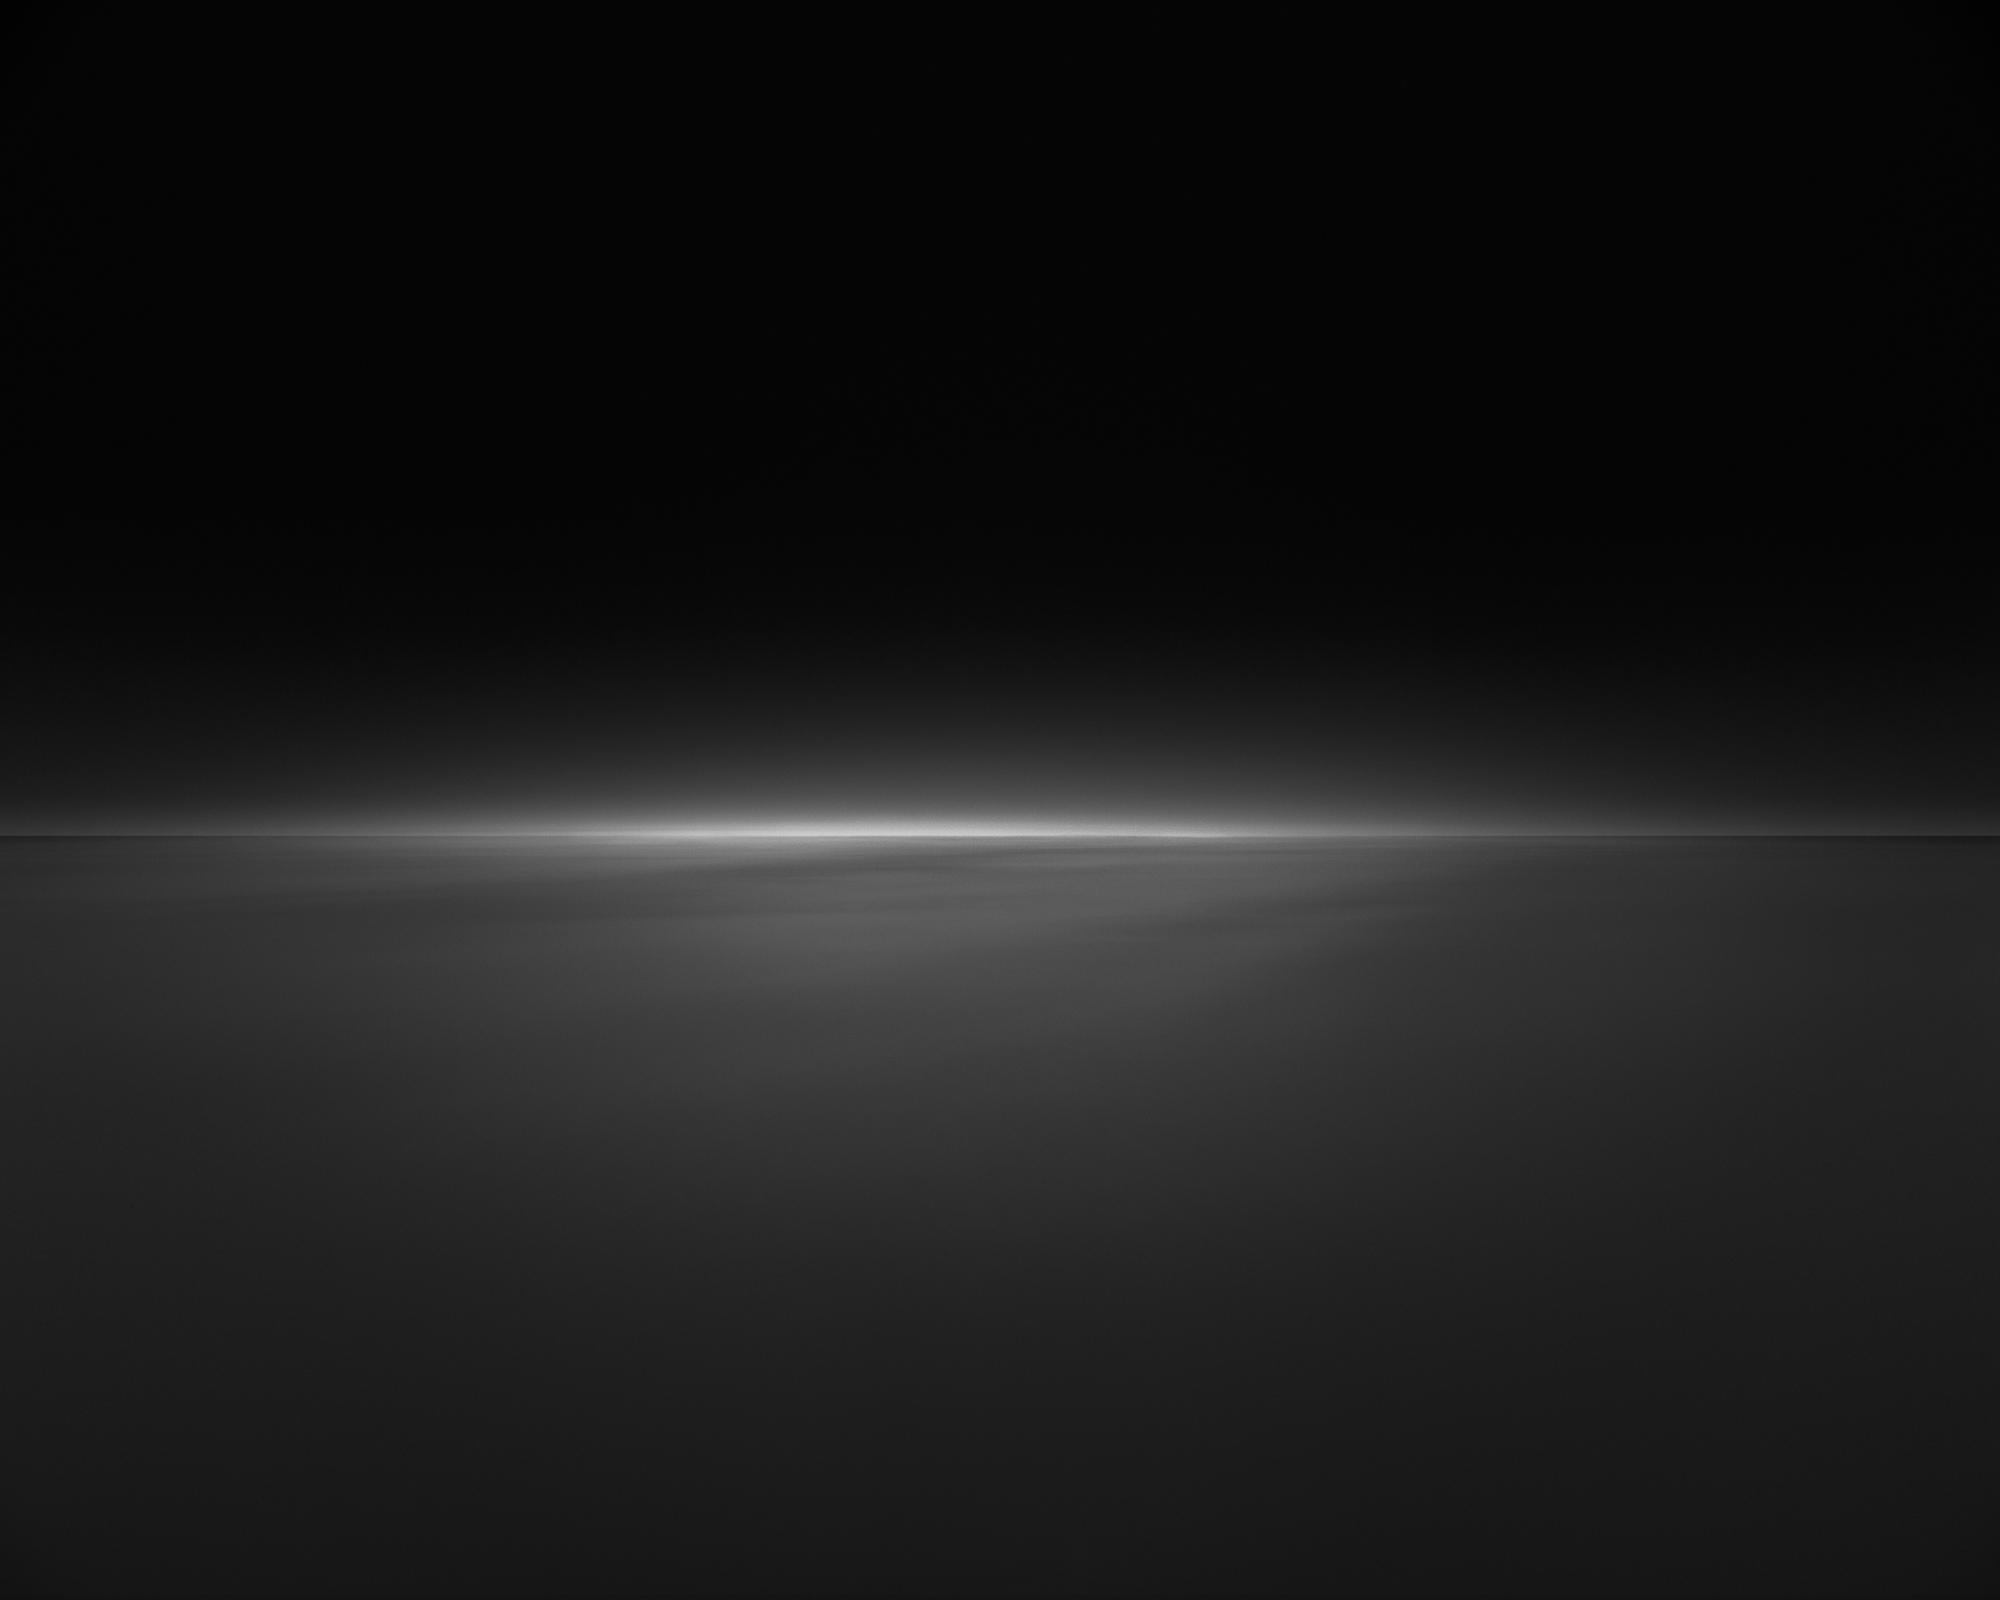 05_Seeking The Silence.jpg